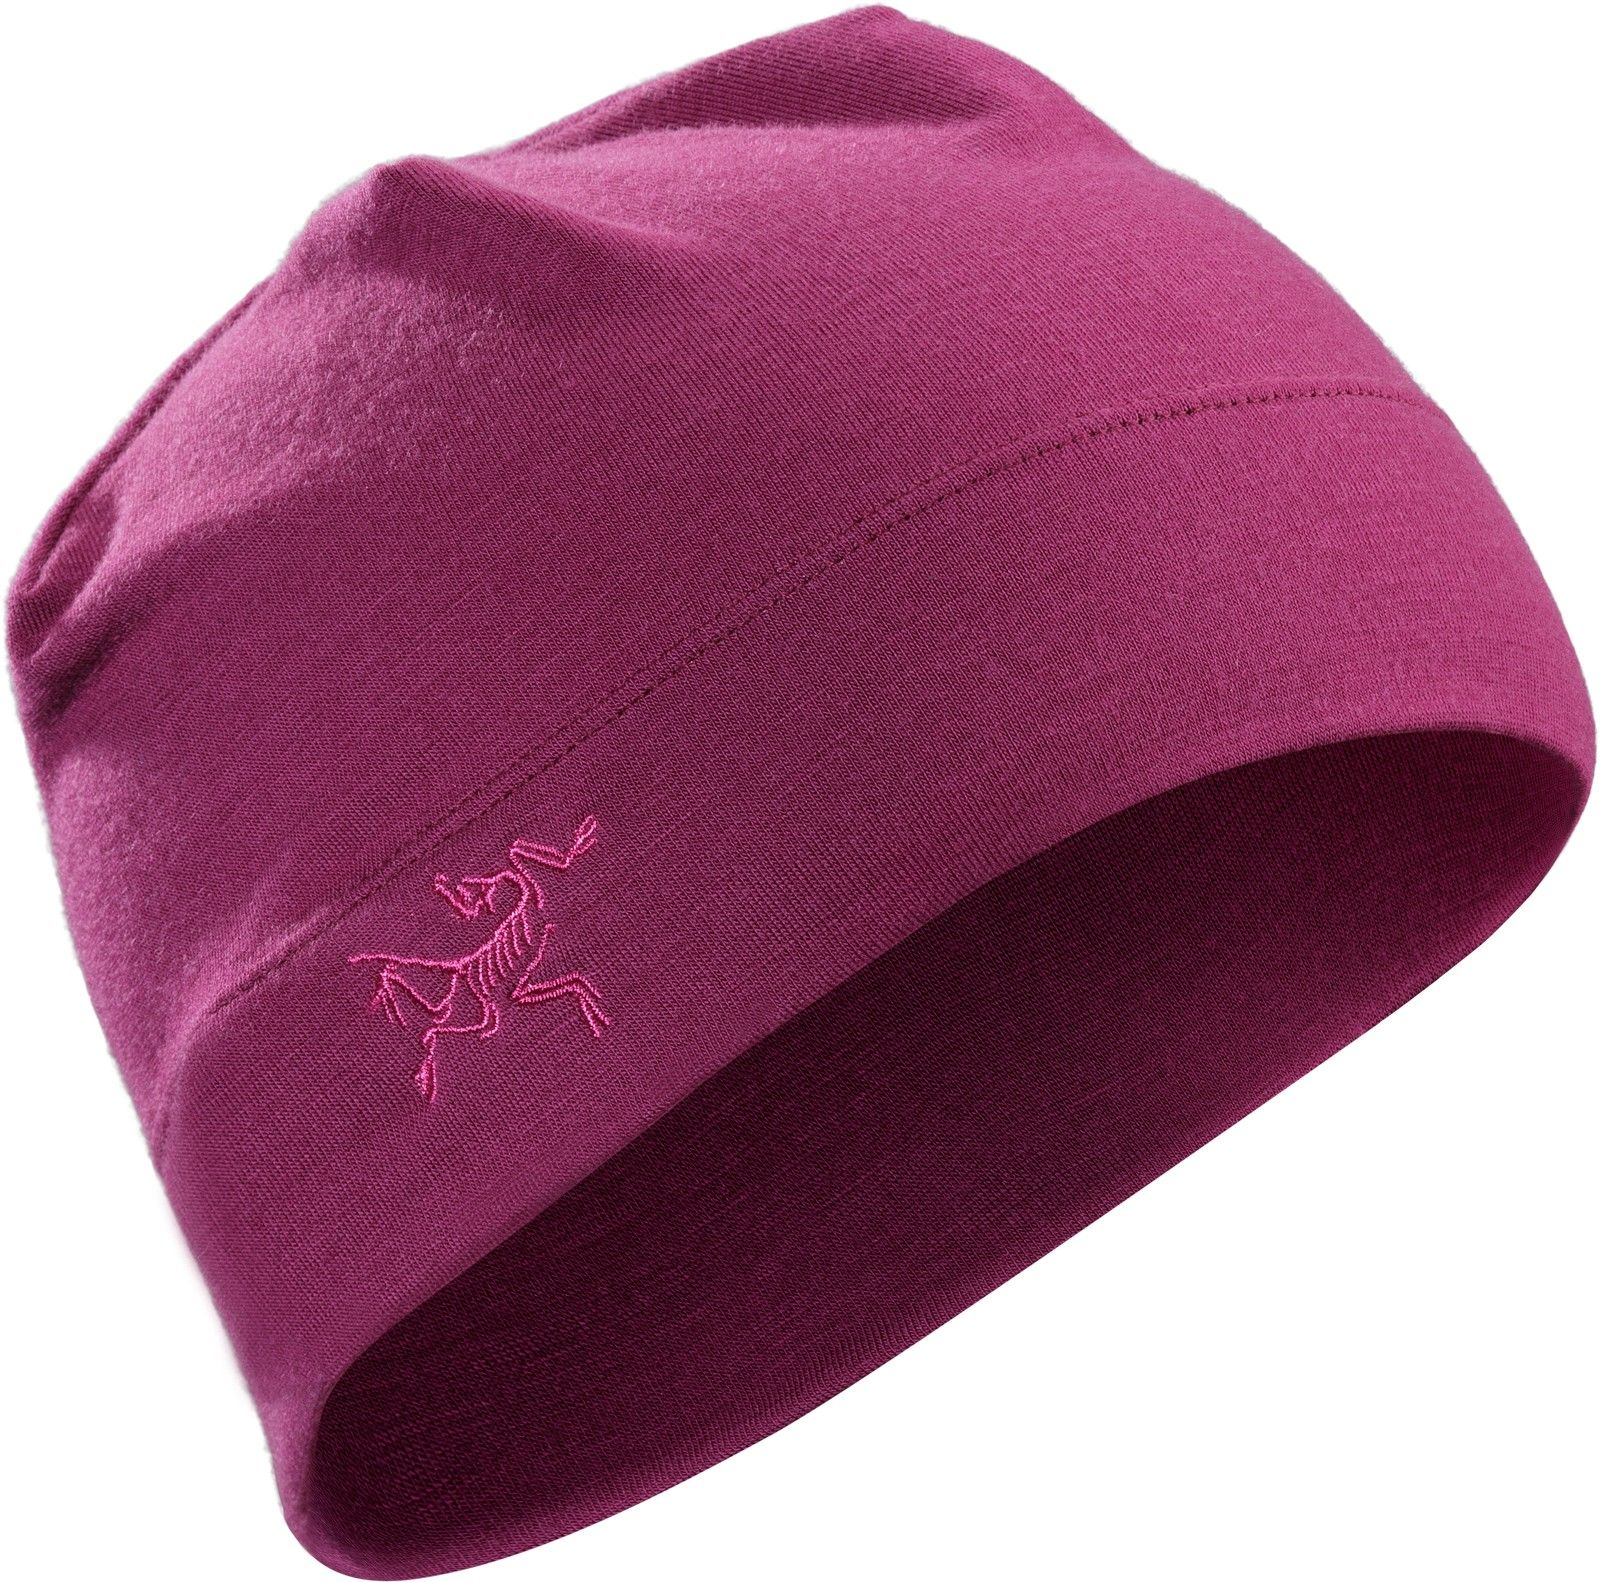 Arcteryx RHO LTW Beanie |  Accessoires